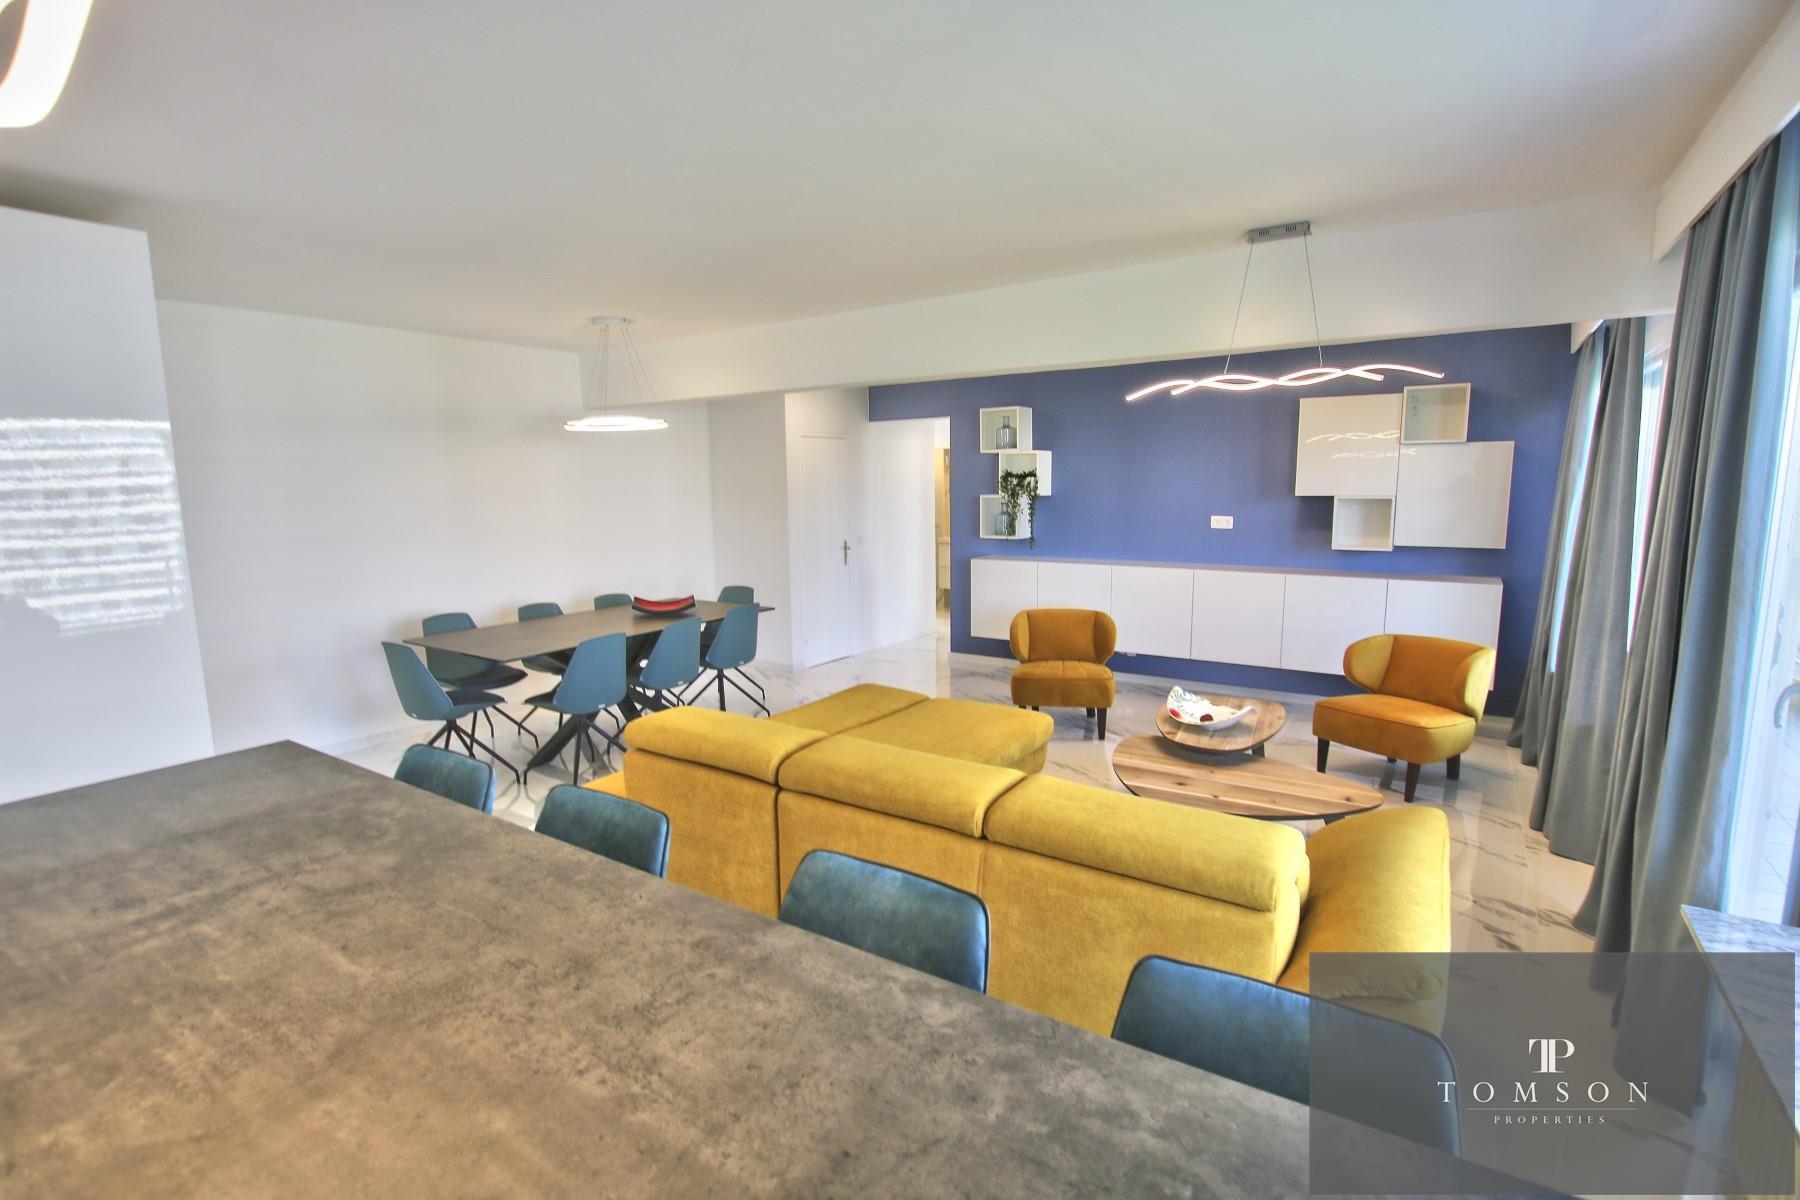 Appartement - Woluwe-Saint-Lambert - #4530510-7